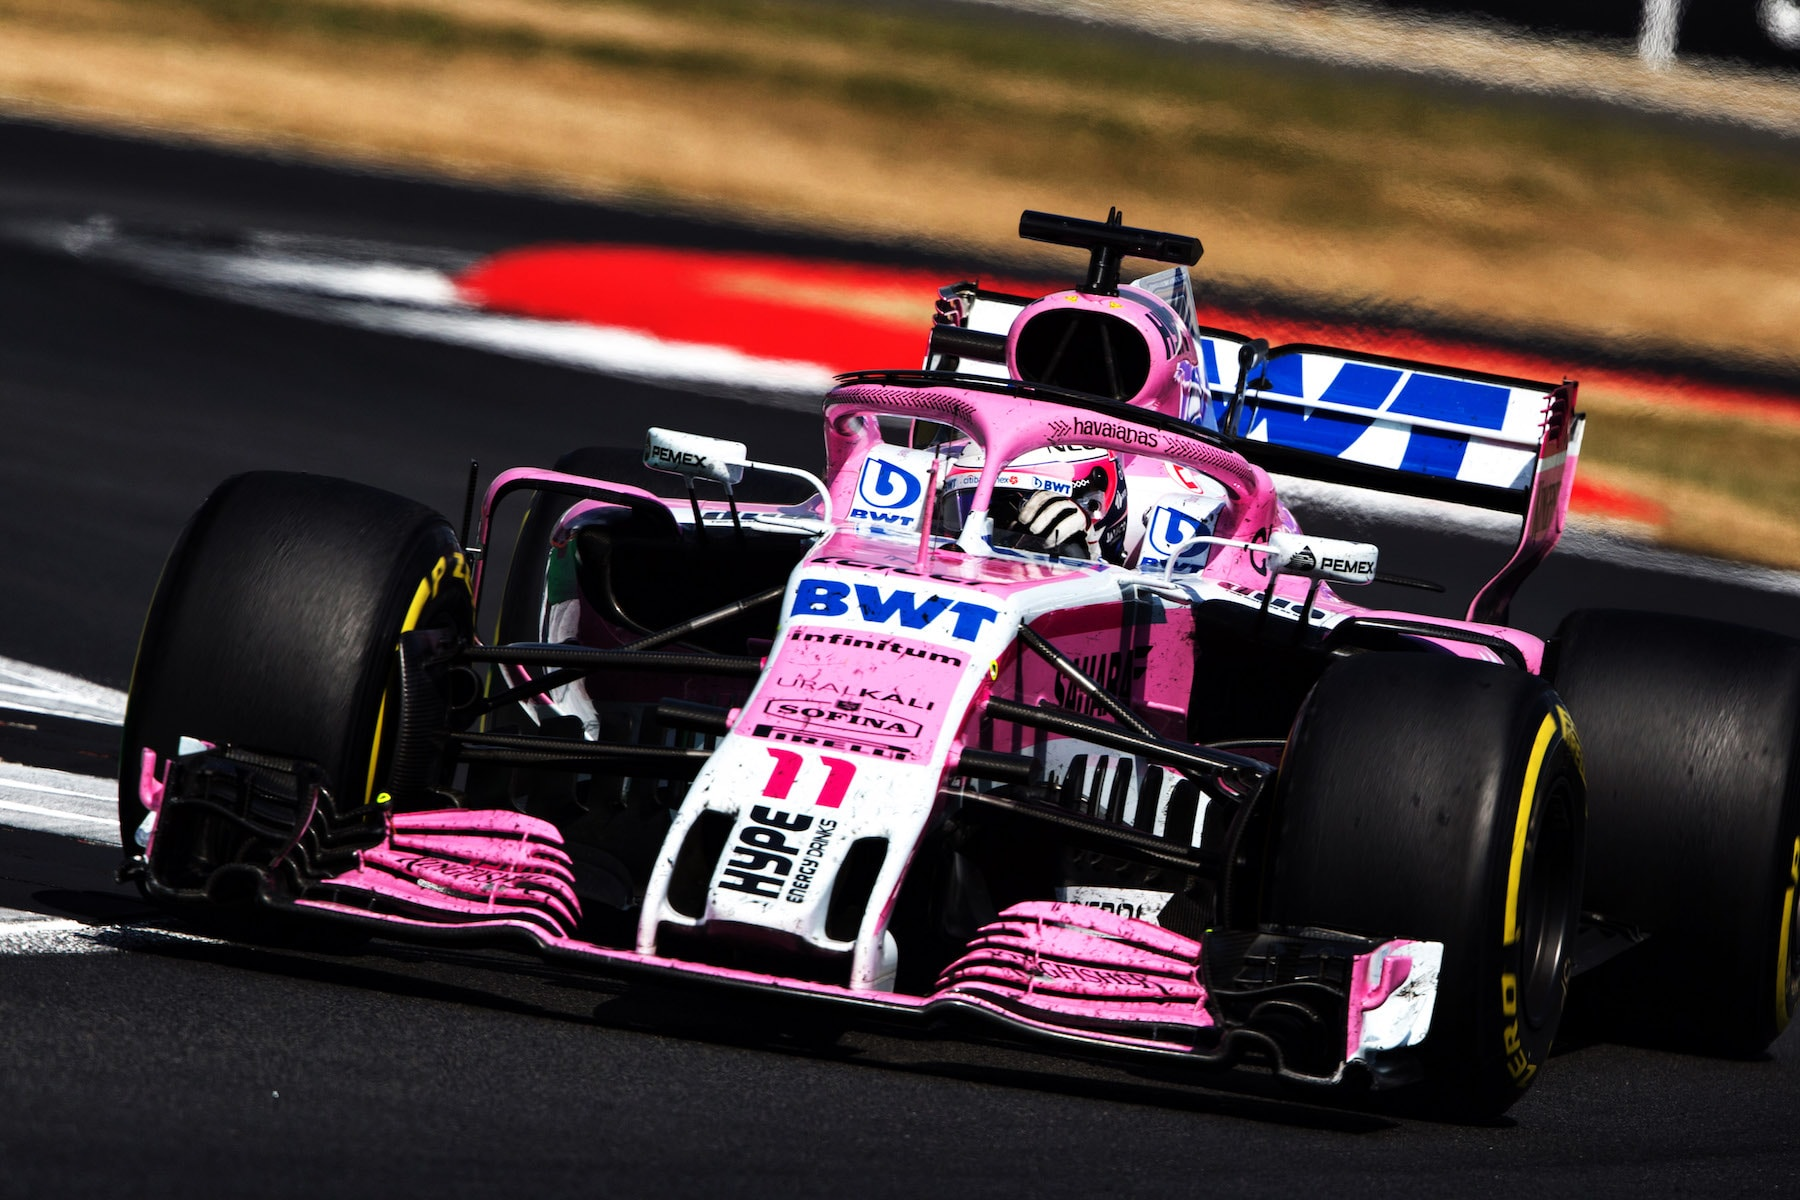 H 2018 Sergio Perez | Force India VJM10 | 2018 British GP 1 copy.jpg